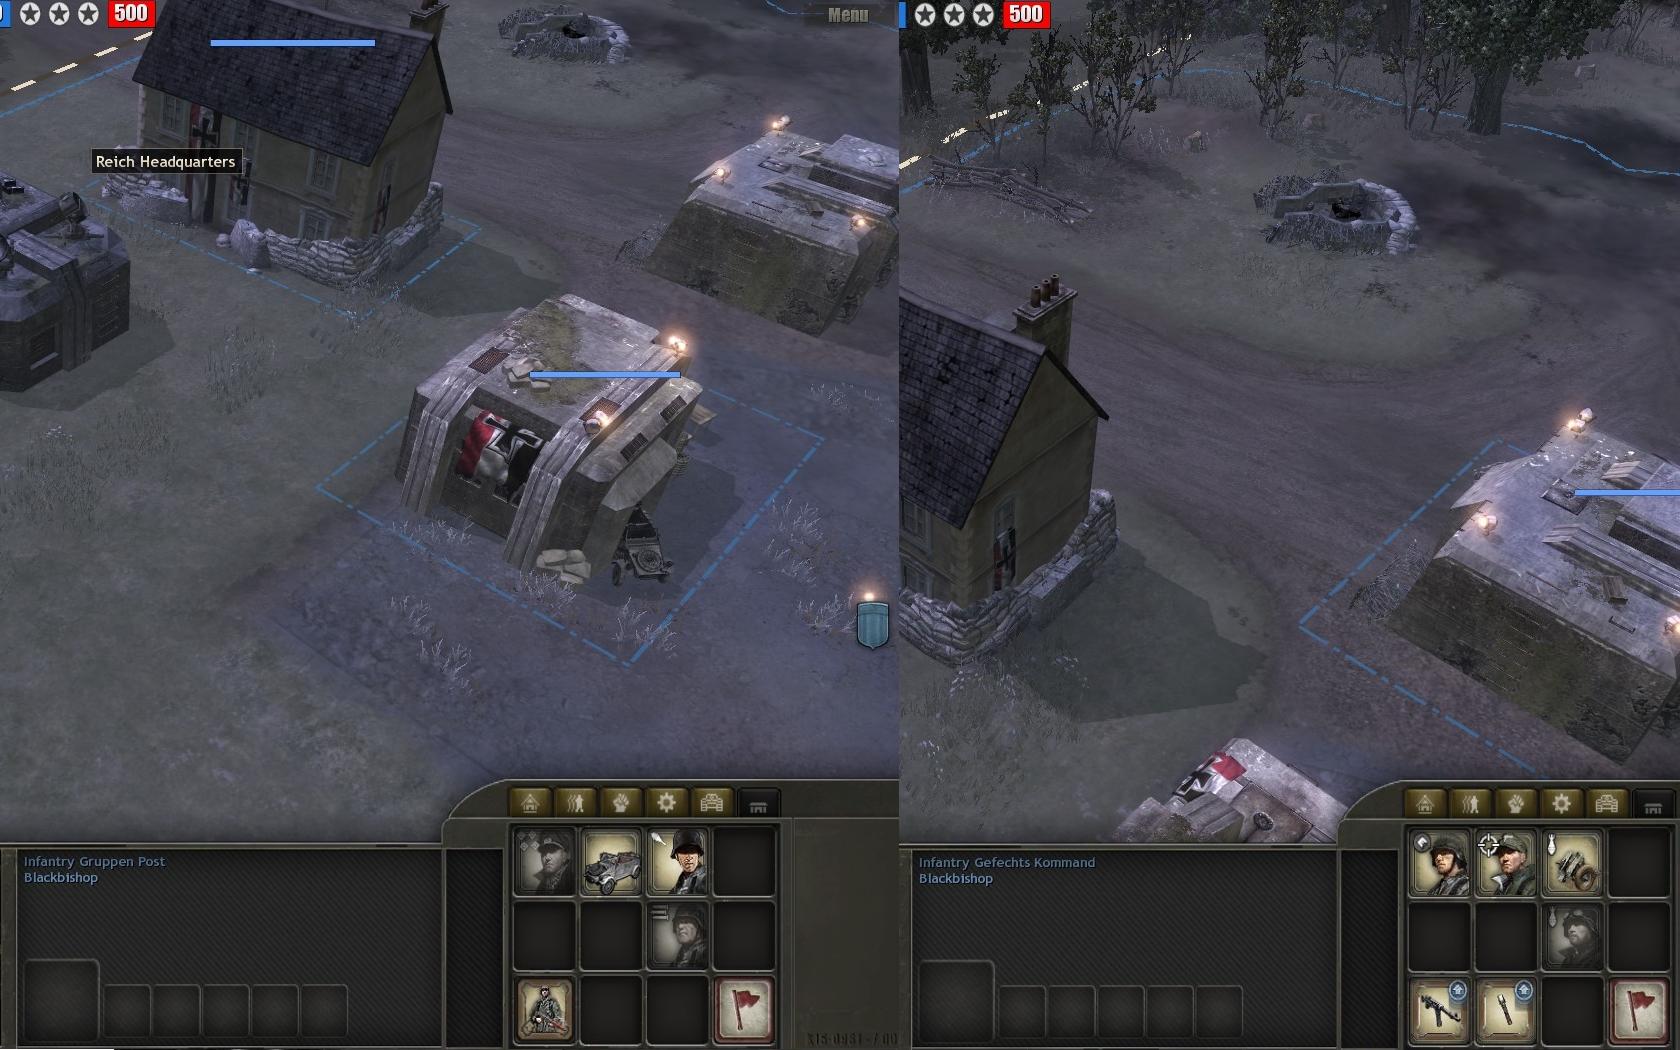 direct2drive unlock code was revoked